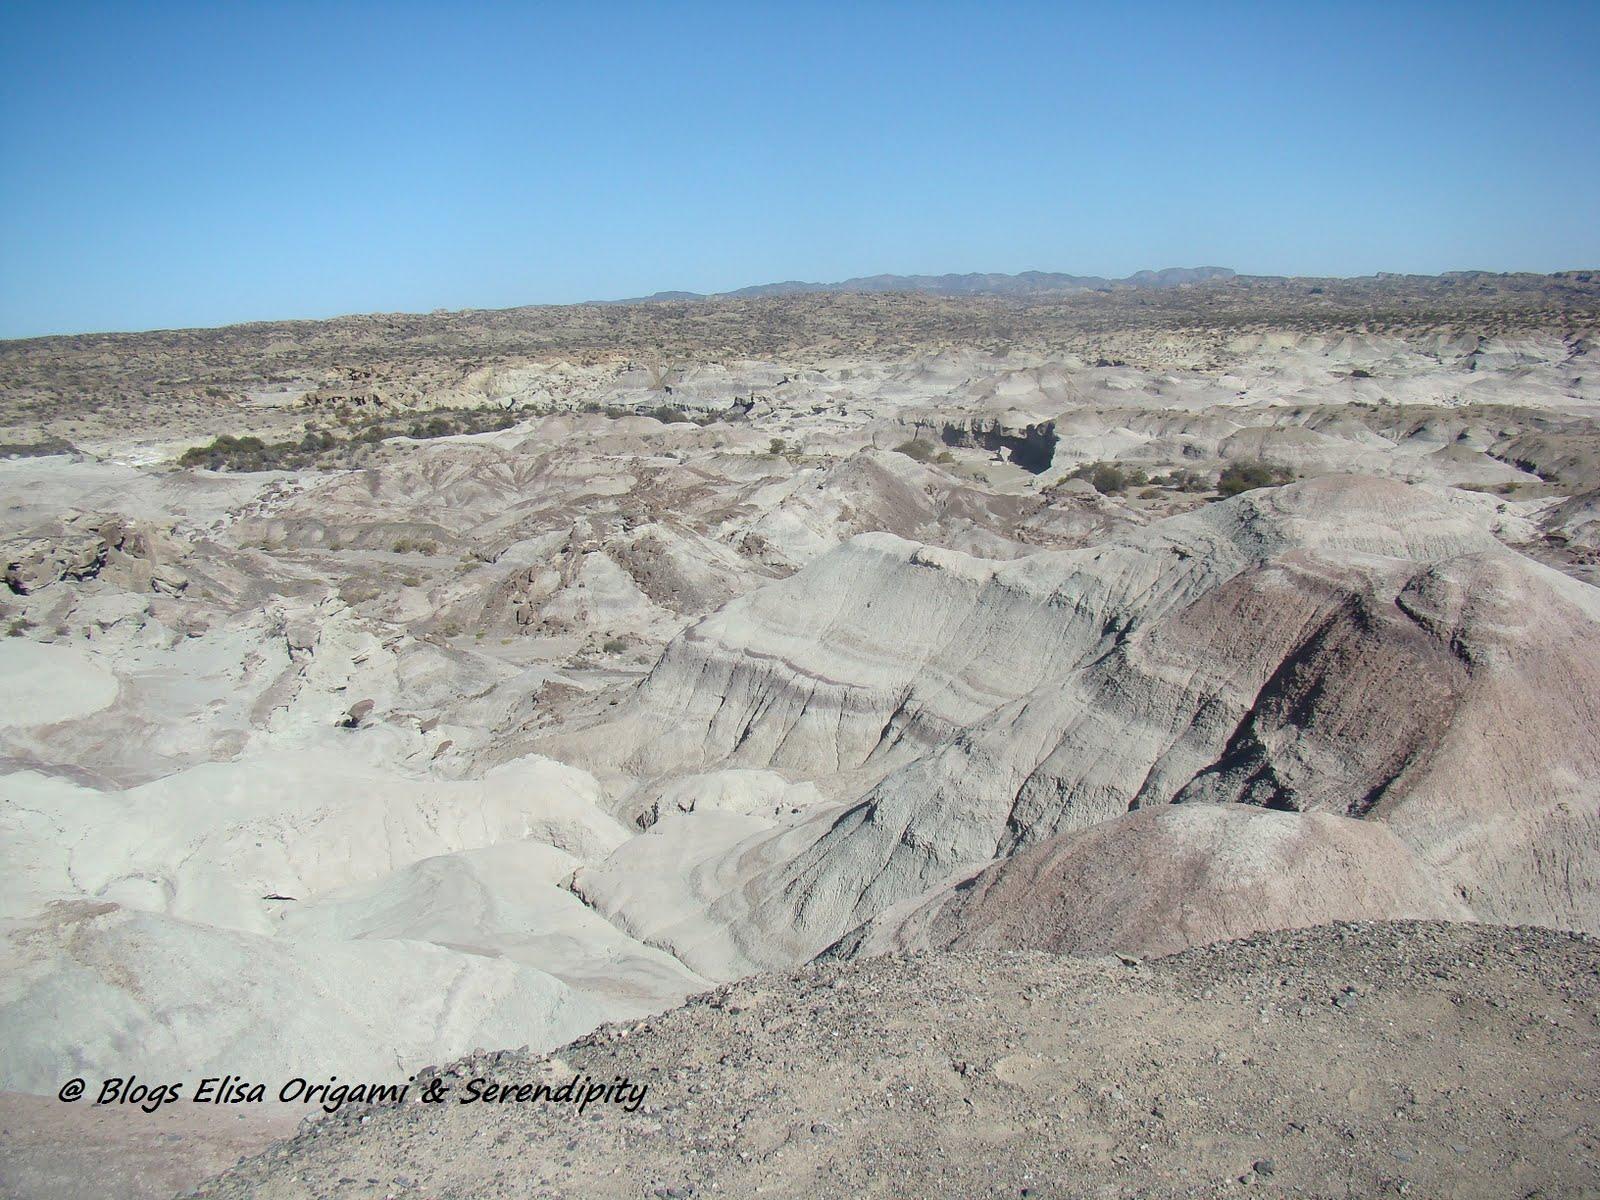 Ischigualasto, Valle de la Luna, San Juan, Argentina, Elisa N, Blog de Viajes, Lifestyle, Travel